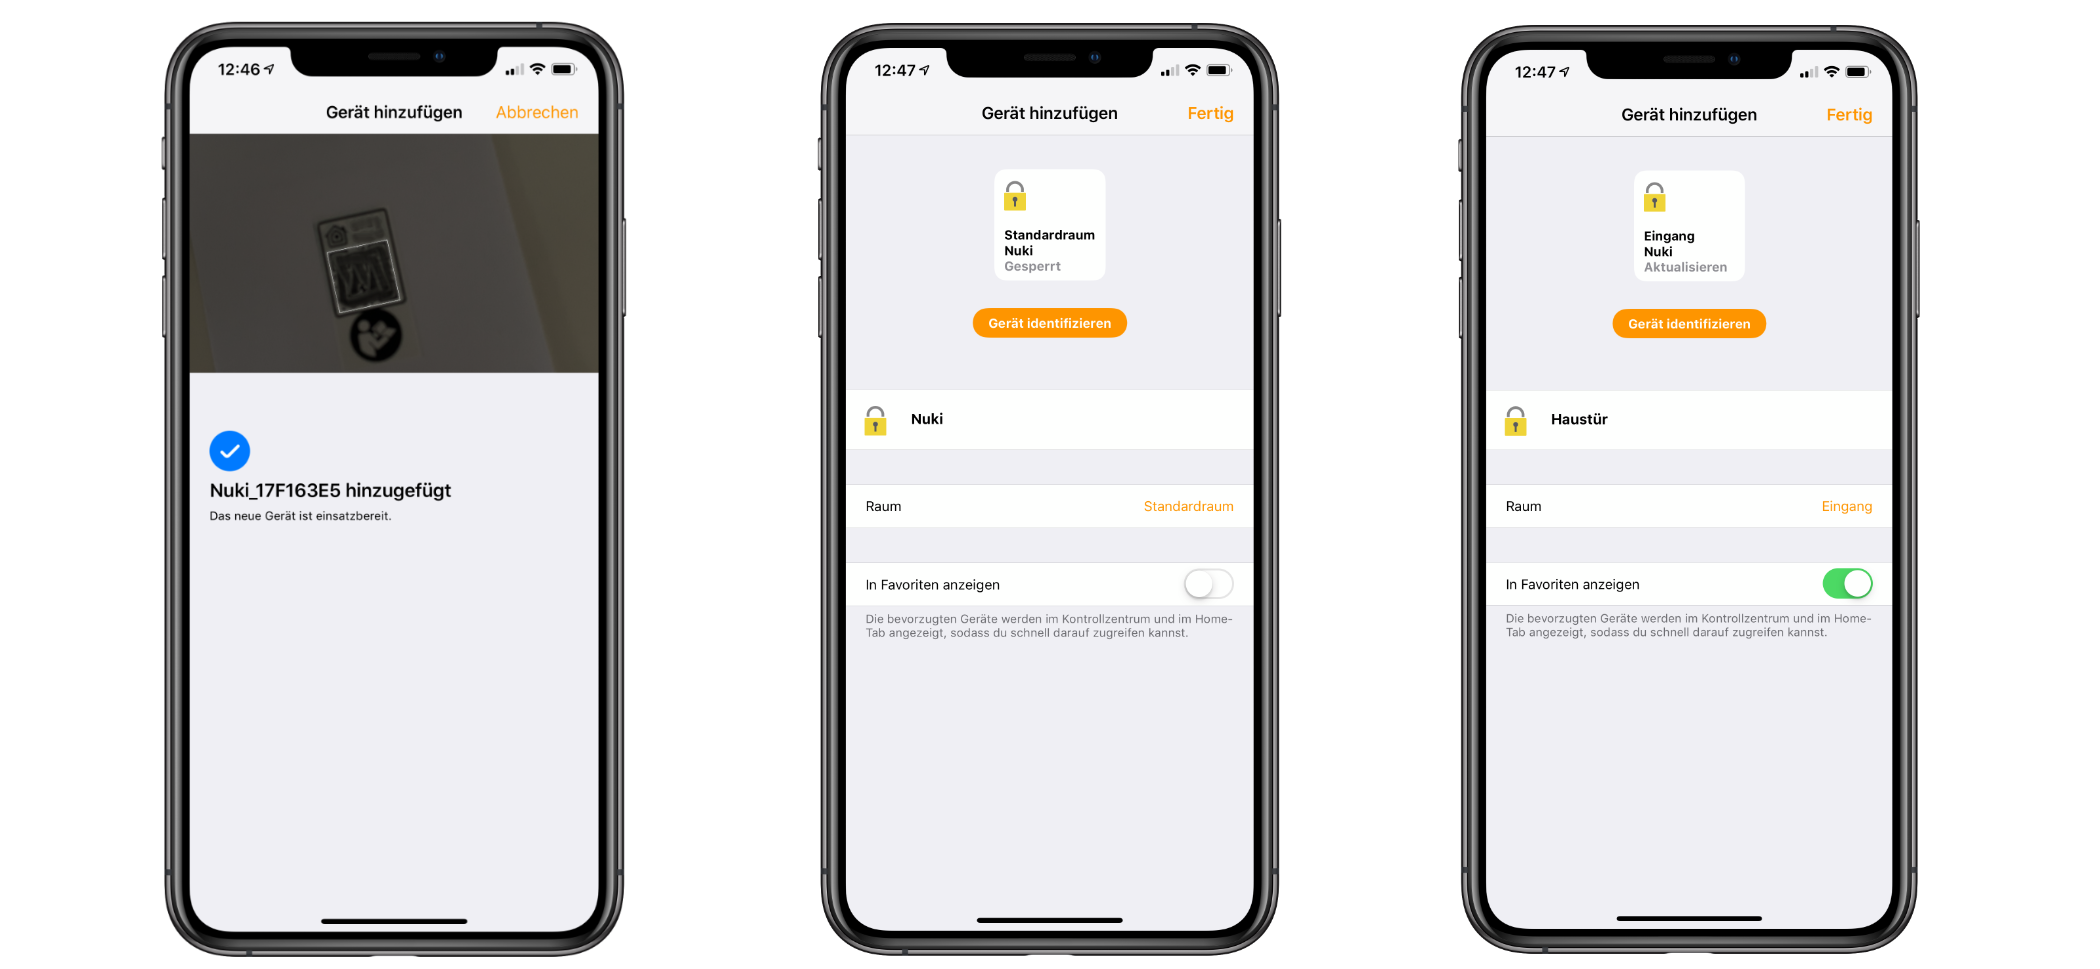 Nuki_HomeKit_Türschloss_SmartHome_Review4 Nuki 2.0 mit Apple HomeKit - das smarte Türschloss